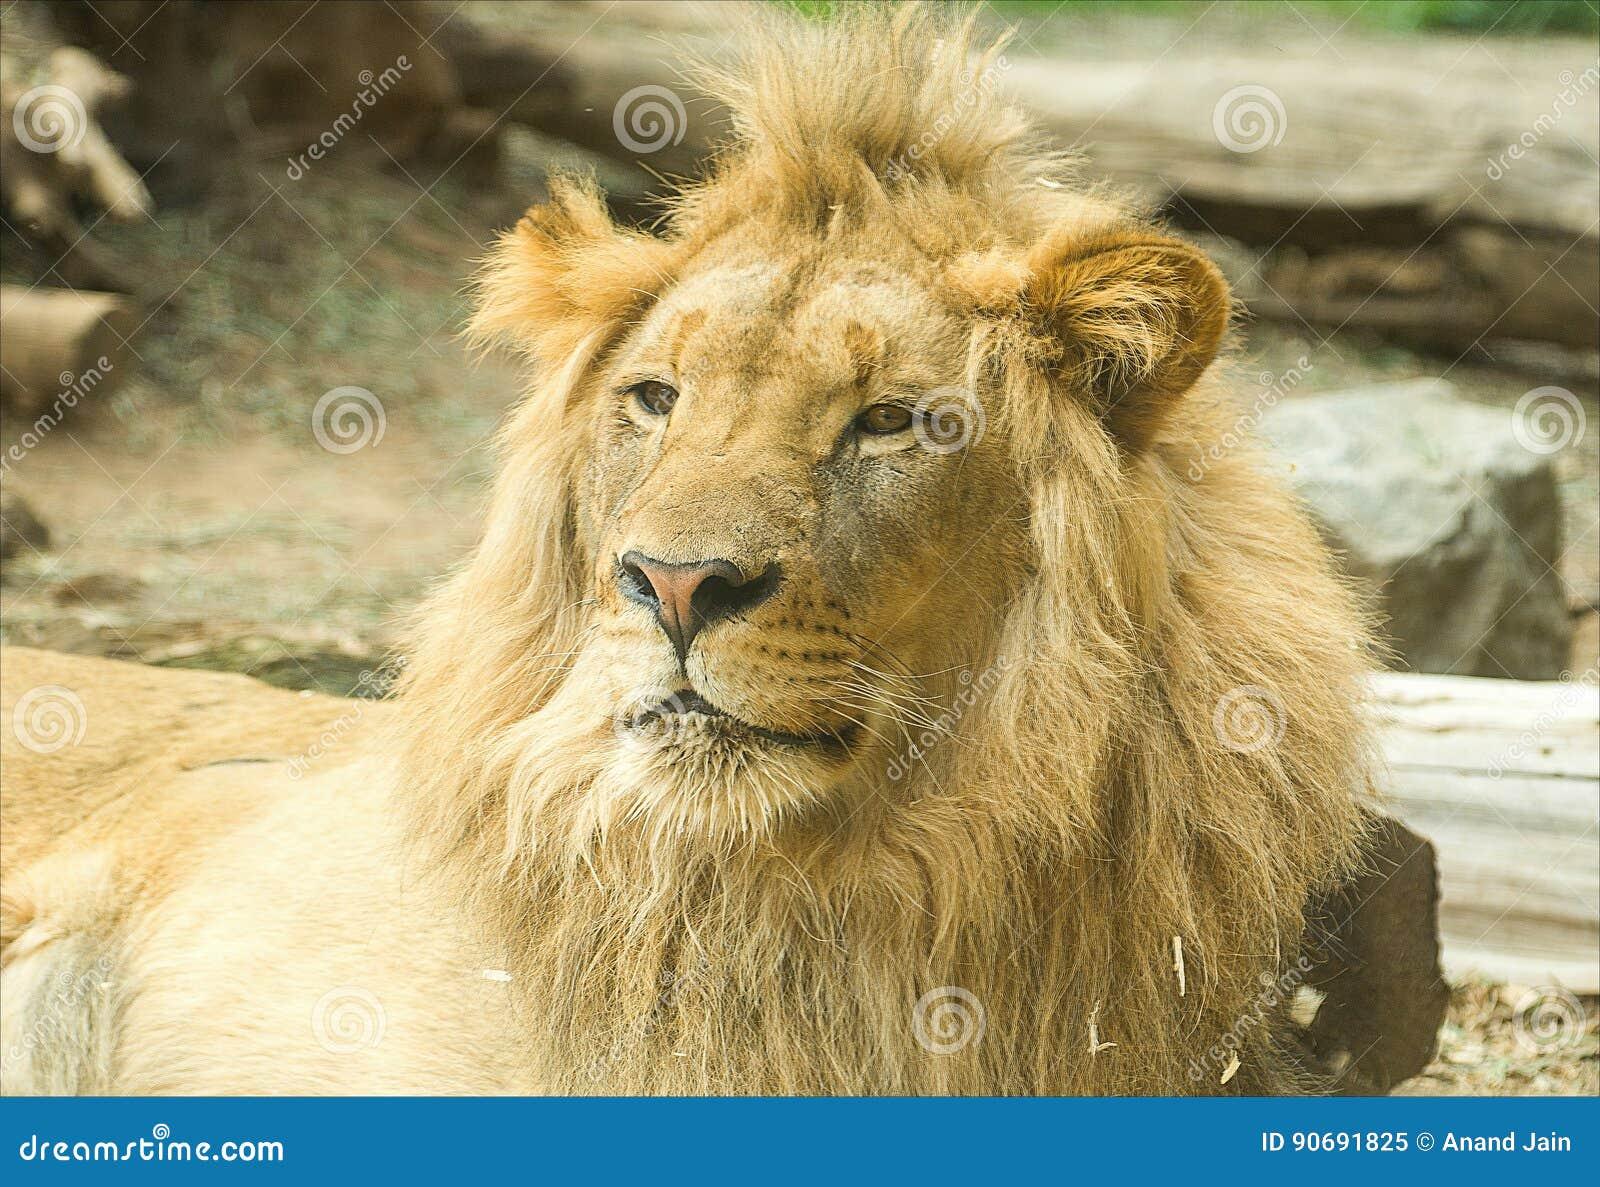 Male Sleepy Lion In Safari Park Stock Image Image Of Park Diego